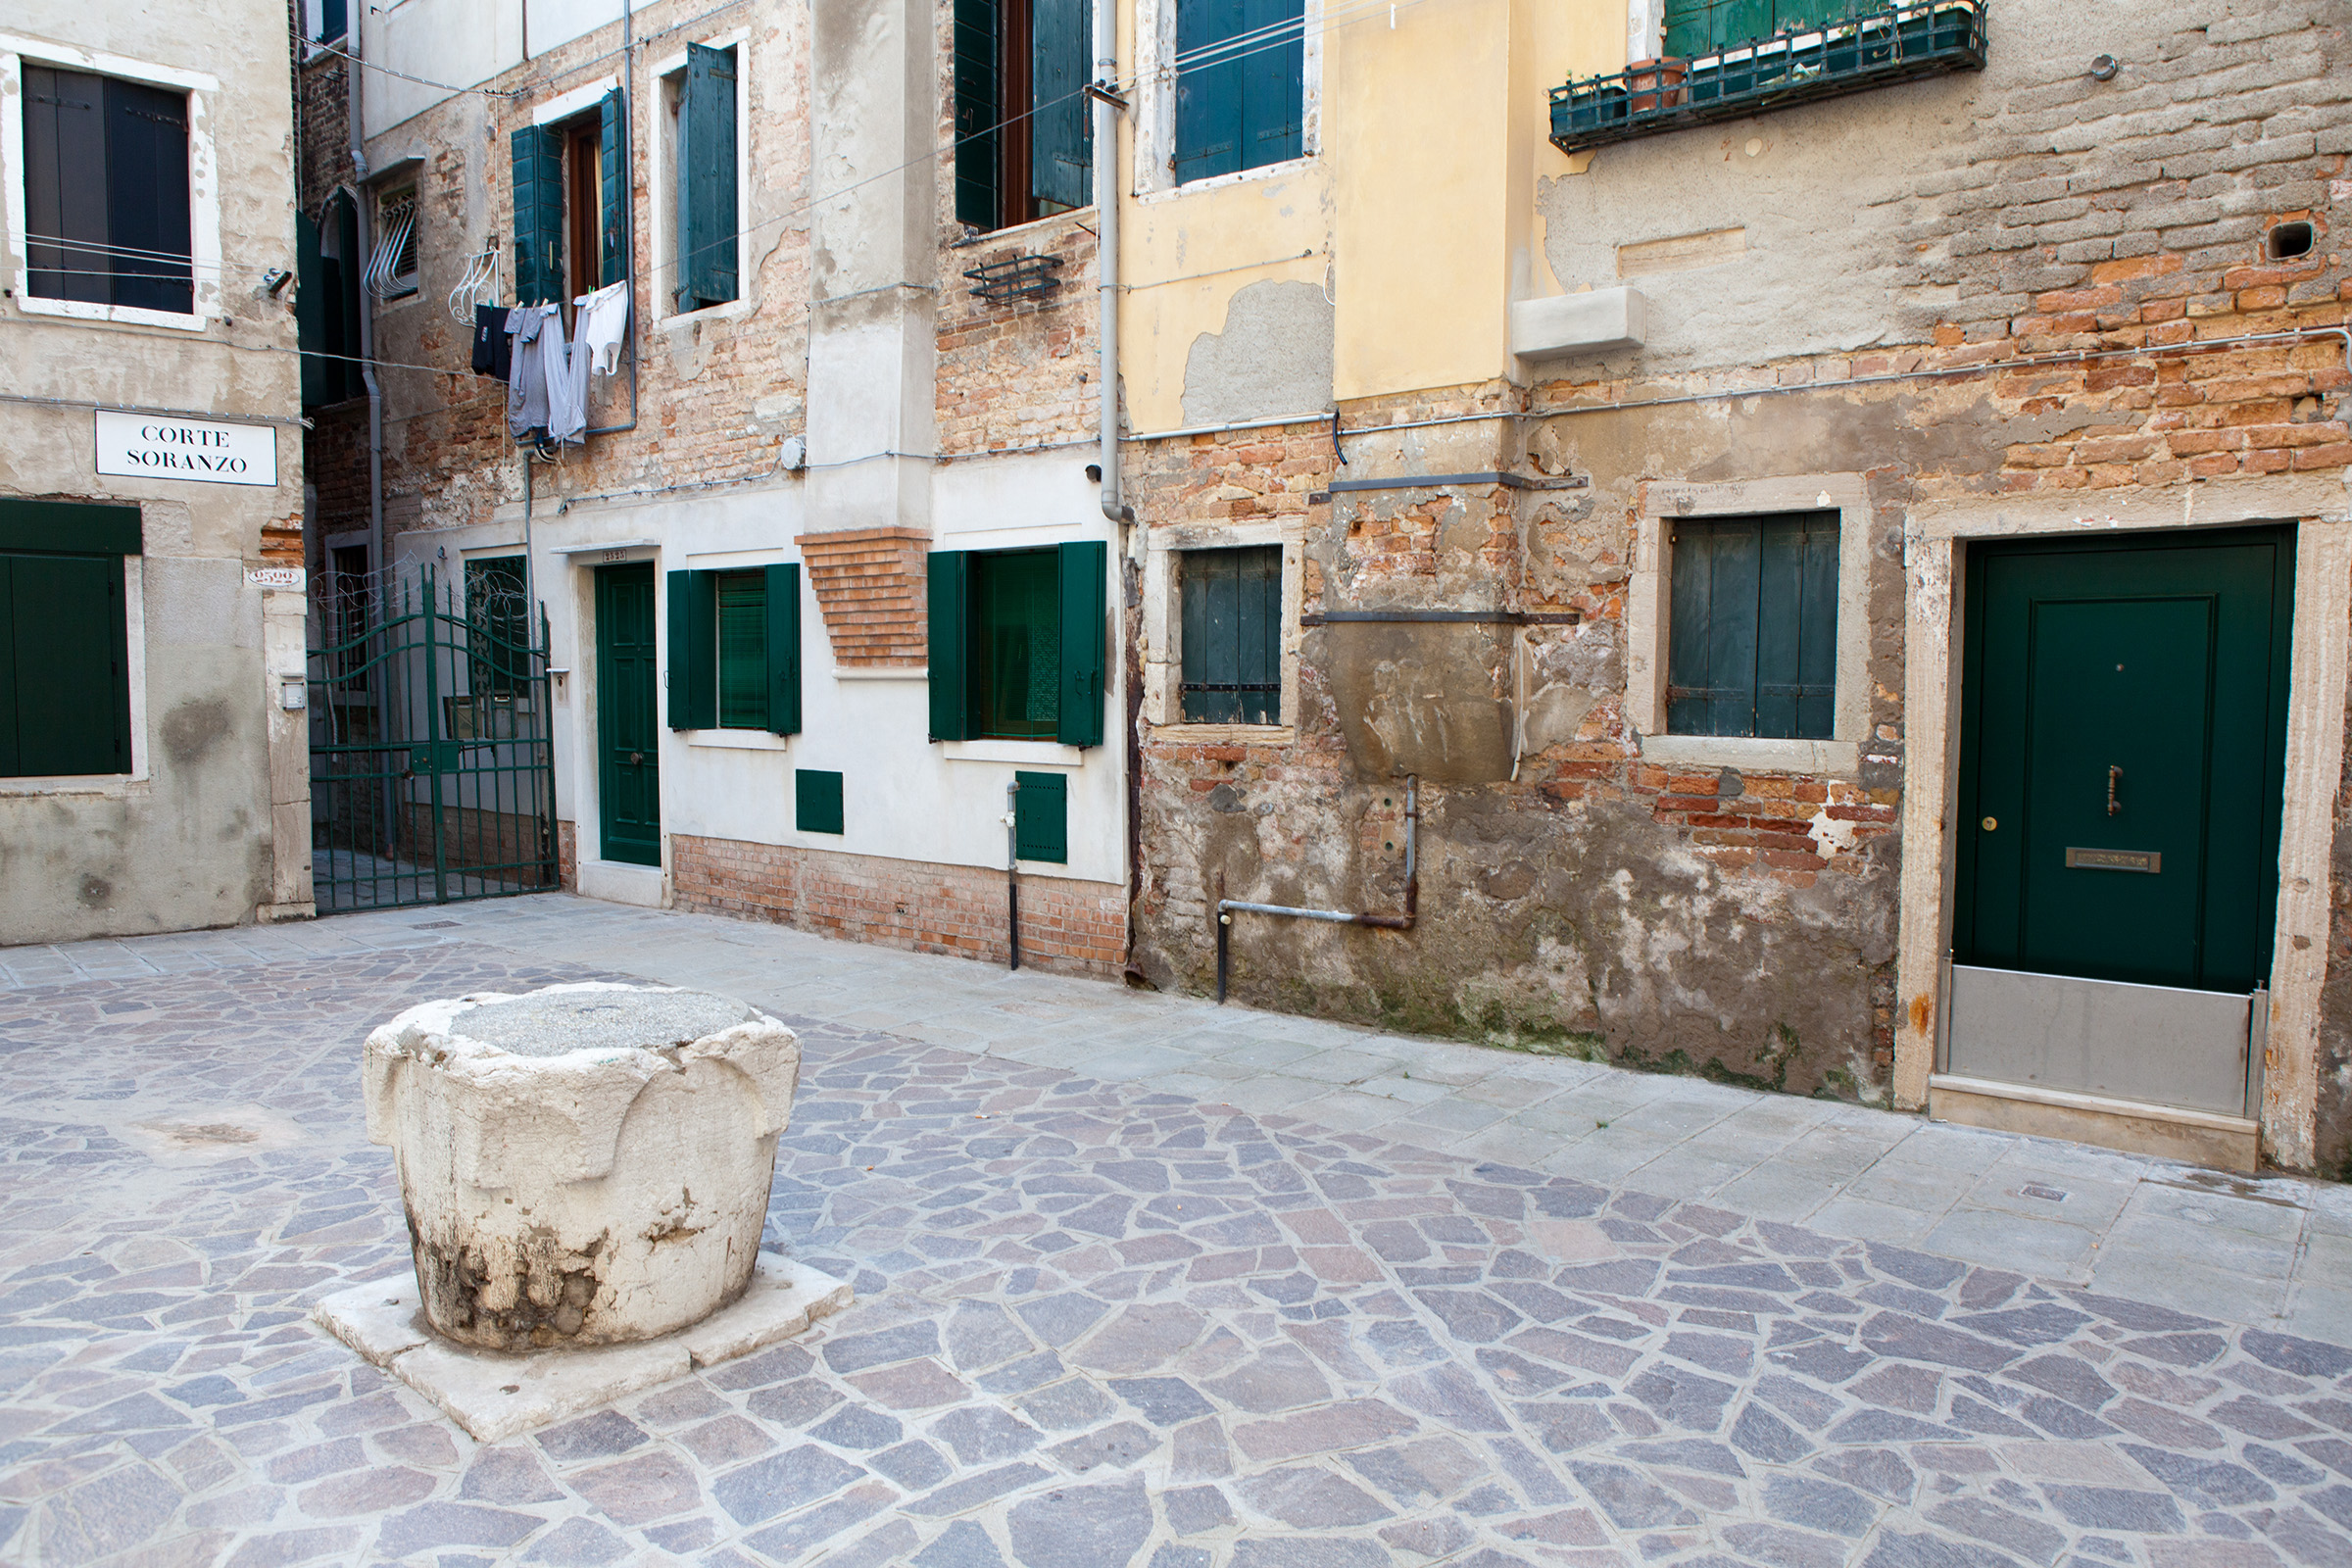 Venice, Adriatic, Tourism, Majestic, Outdoors, HQ Photo